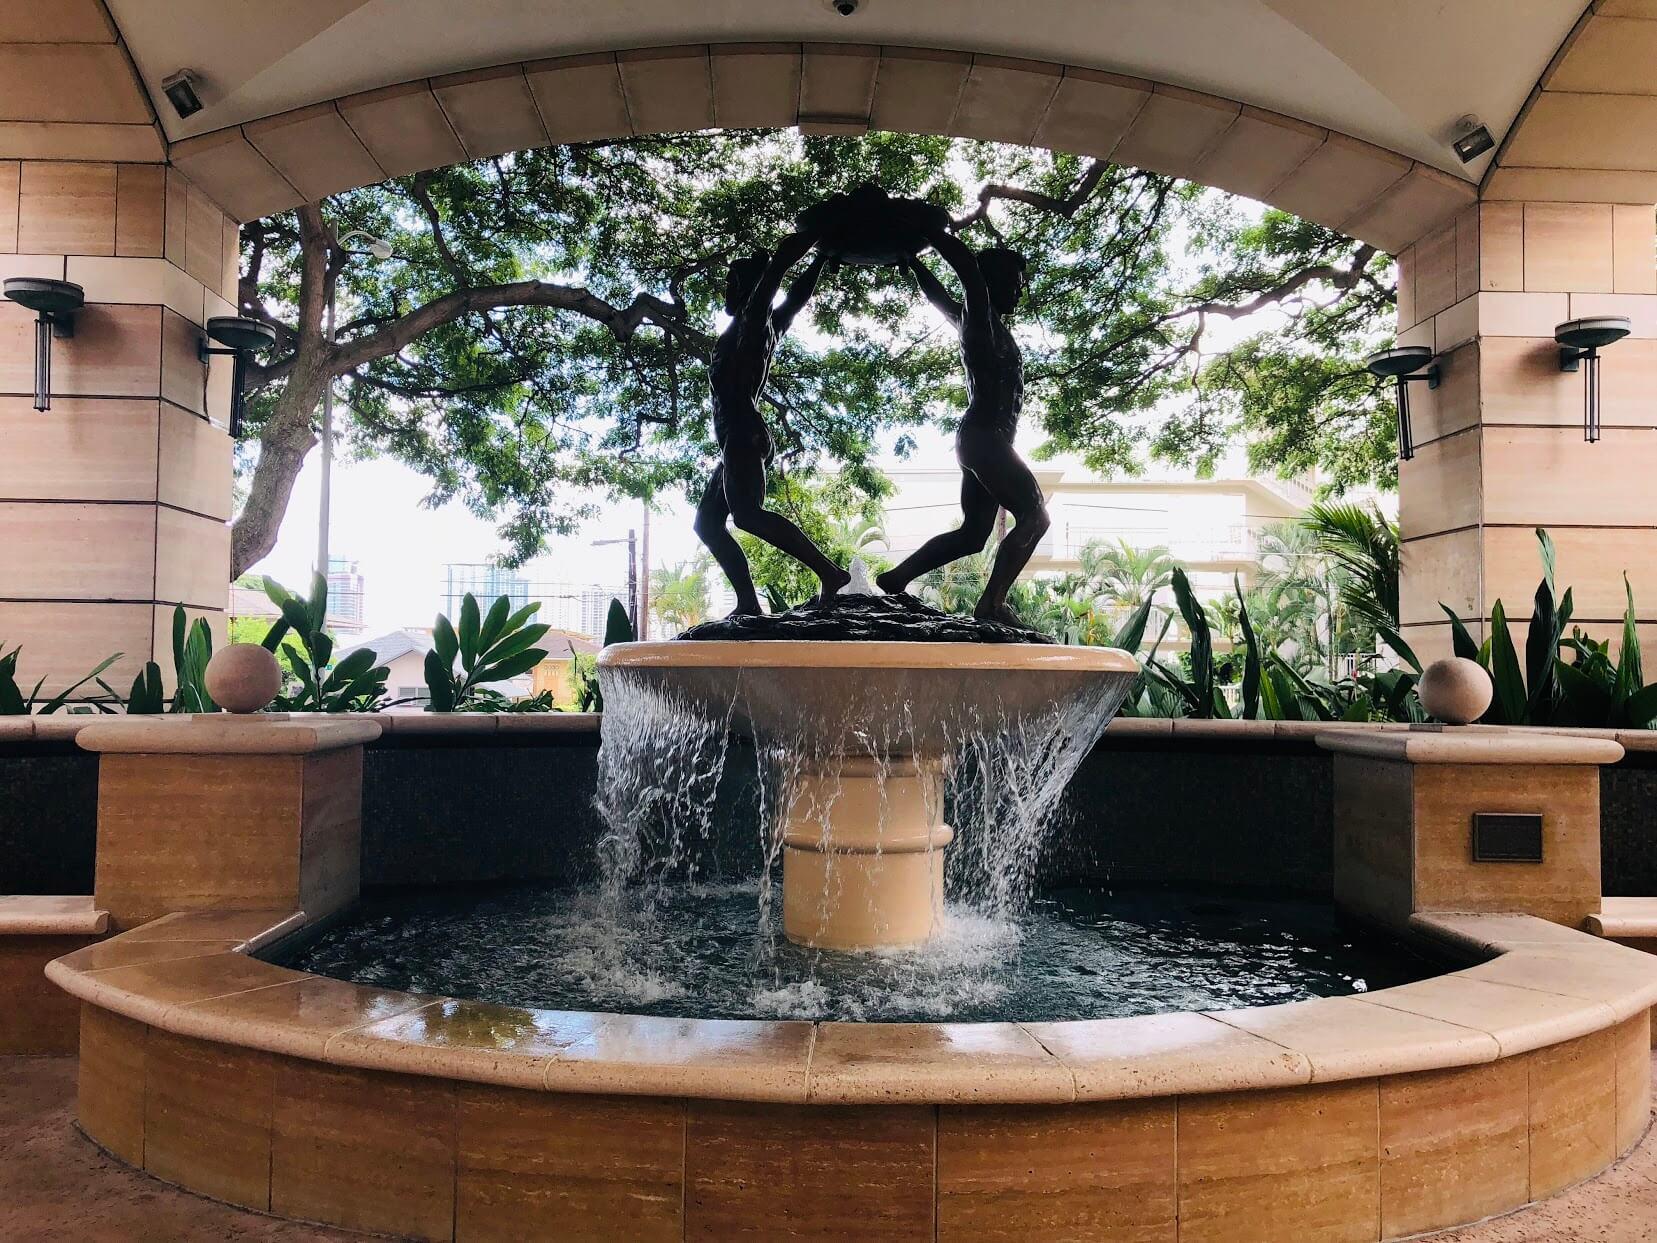 Courtyards at Punahouの噴水